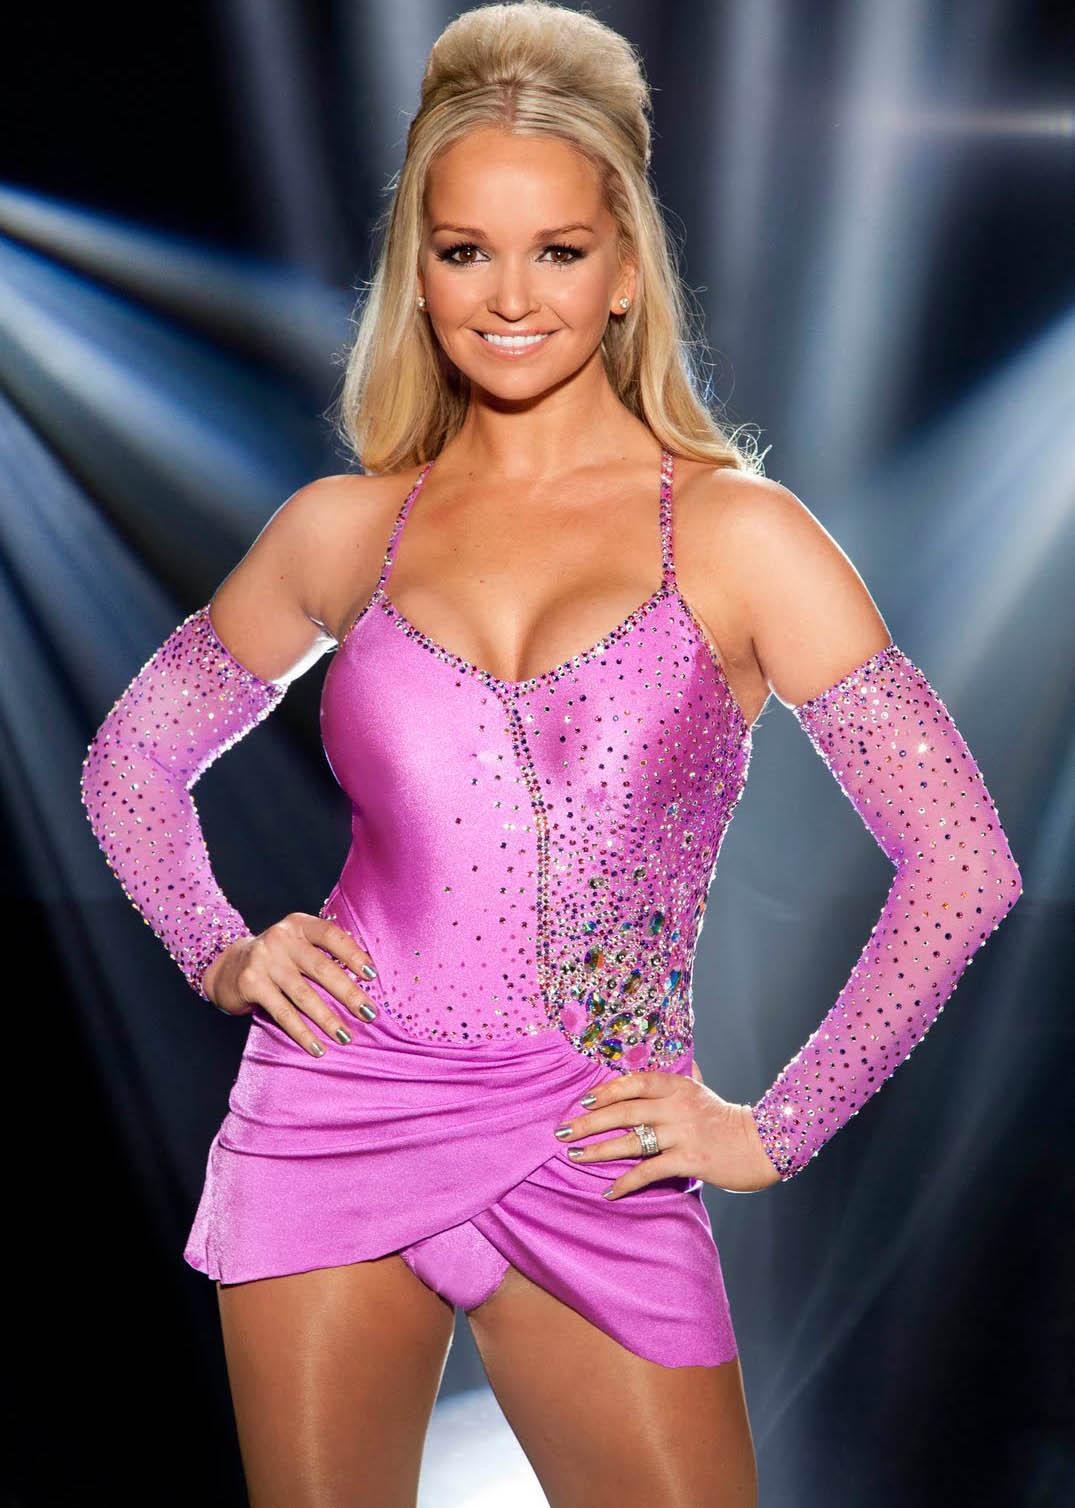 http://4.bp.blogspot.com/-rxnw0n9-12M/TwwQHcchPpI/AAAAAAAAC2A/AslbhToe8lc/s1600/jennifer_ellison_dancing_on_ice.jpg